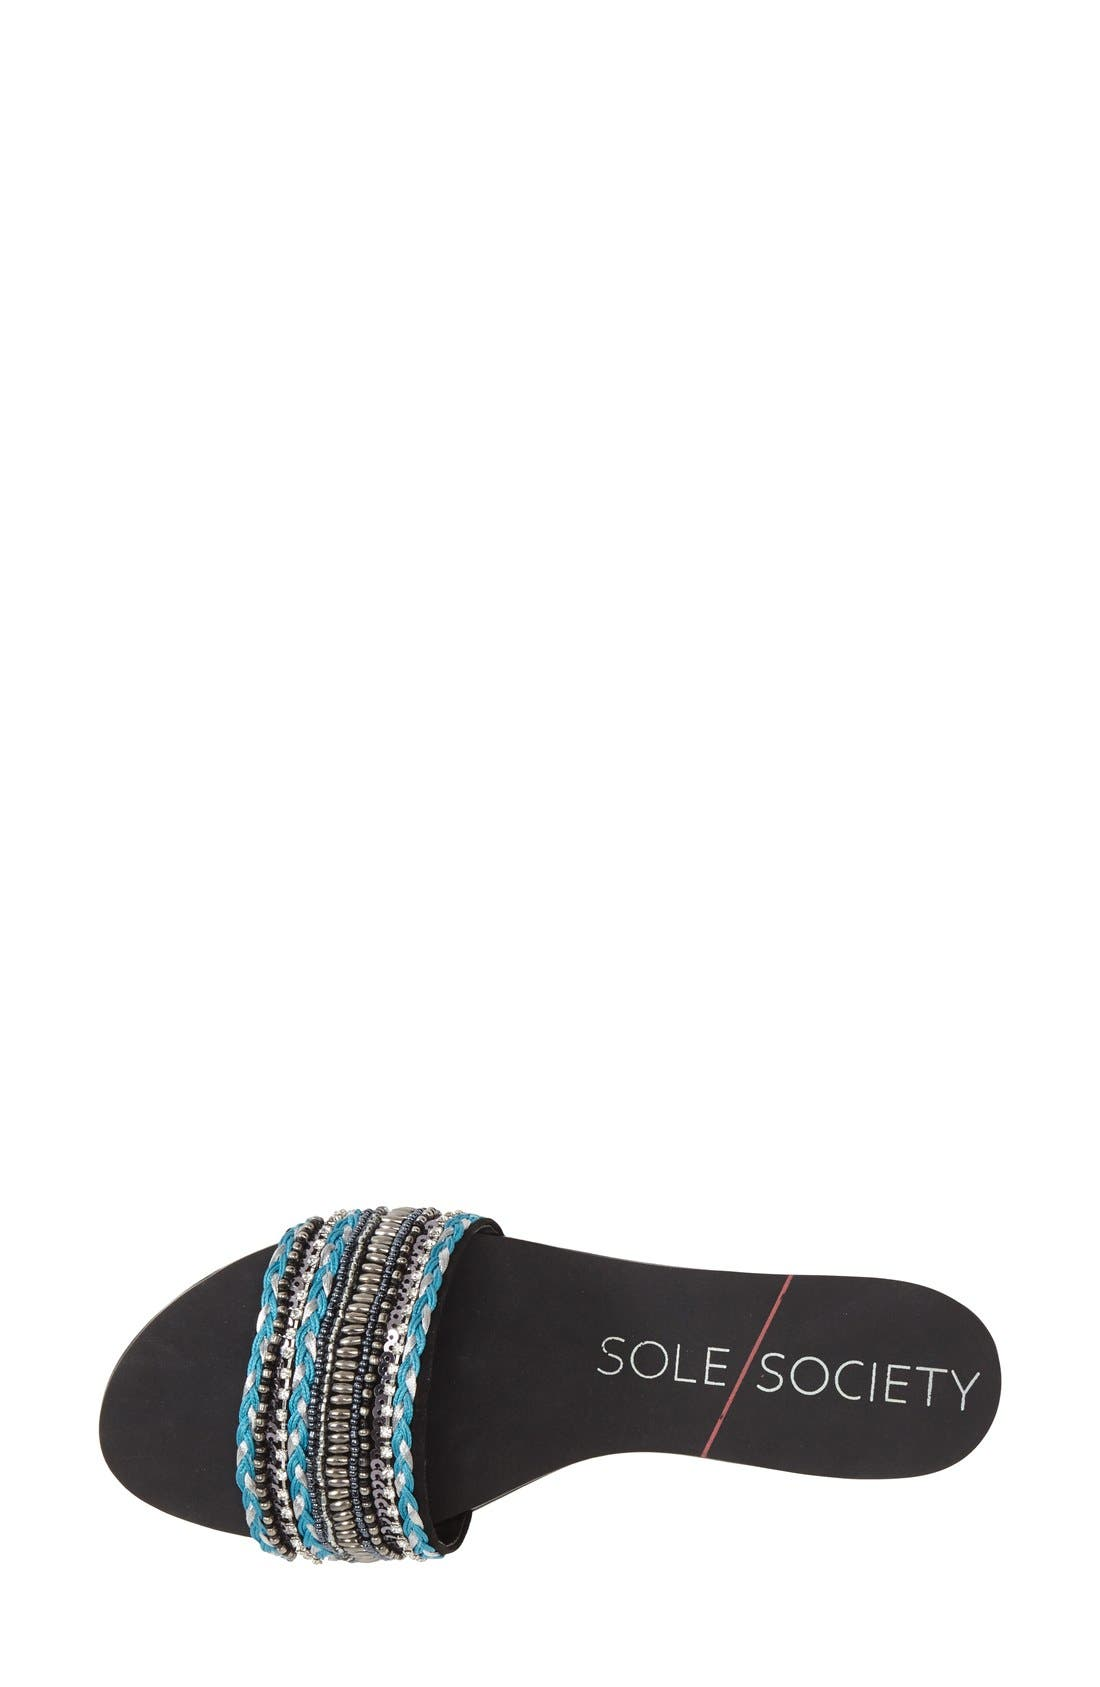 SOLE SOCIETY, 'Eliana' Slide Sandal, Alternate thumbnail 2, color, 001